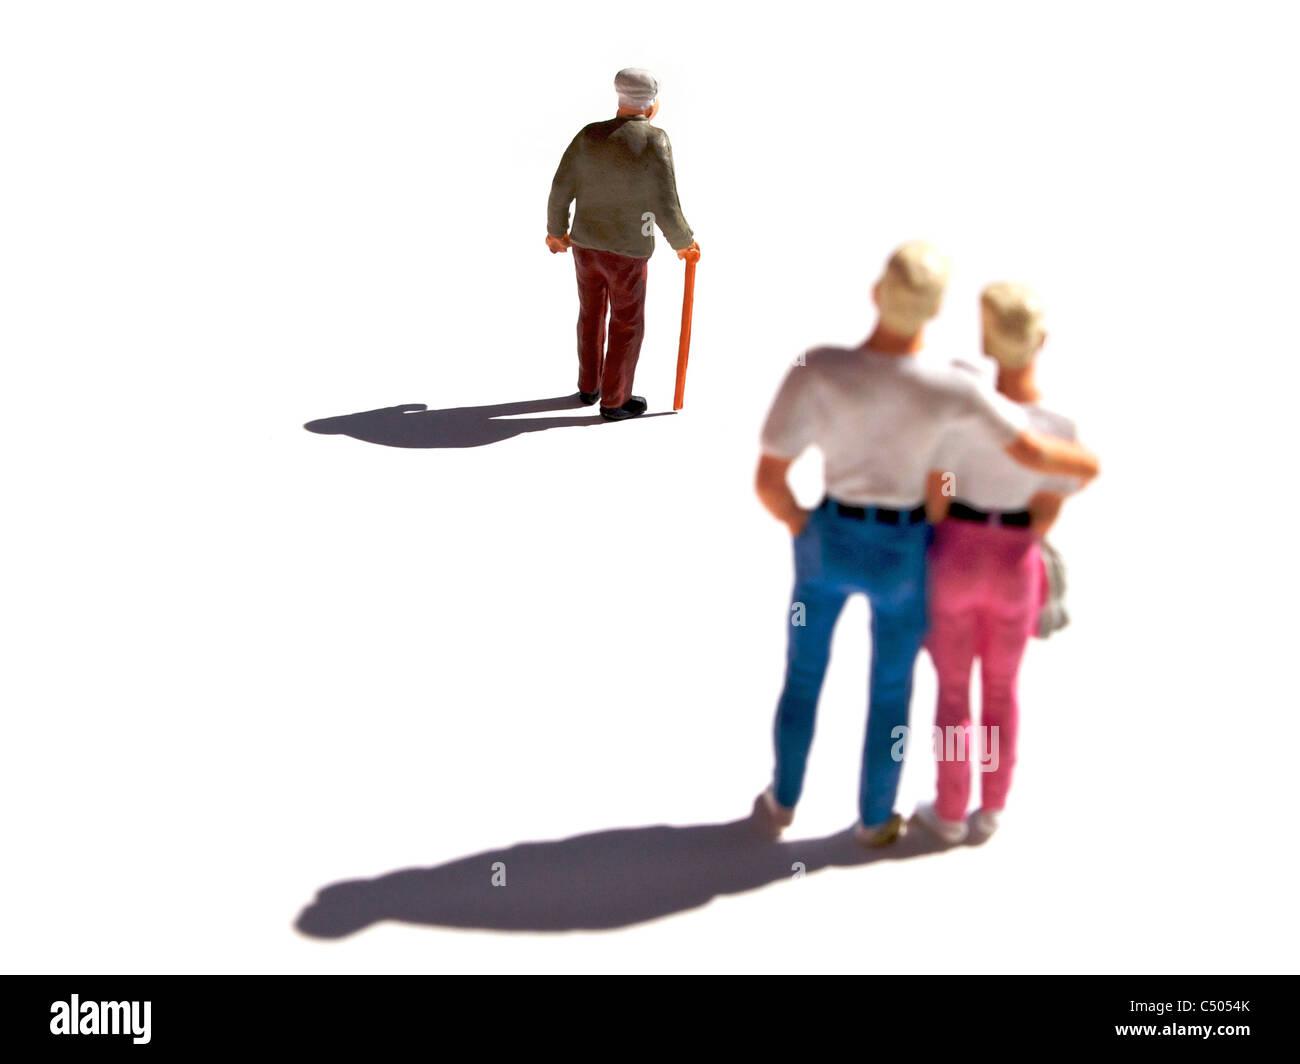 Figurines, symbolic separation. - Stock Image